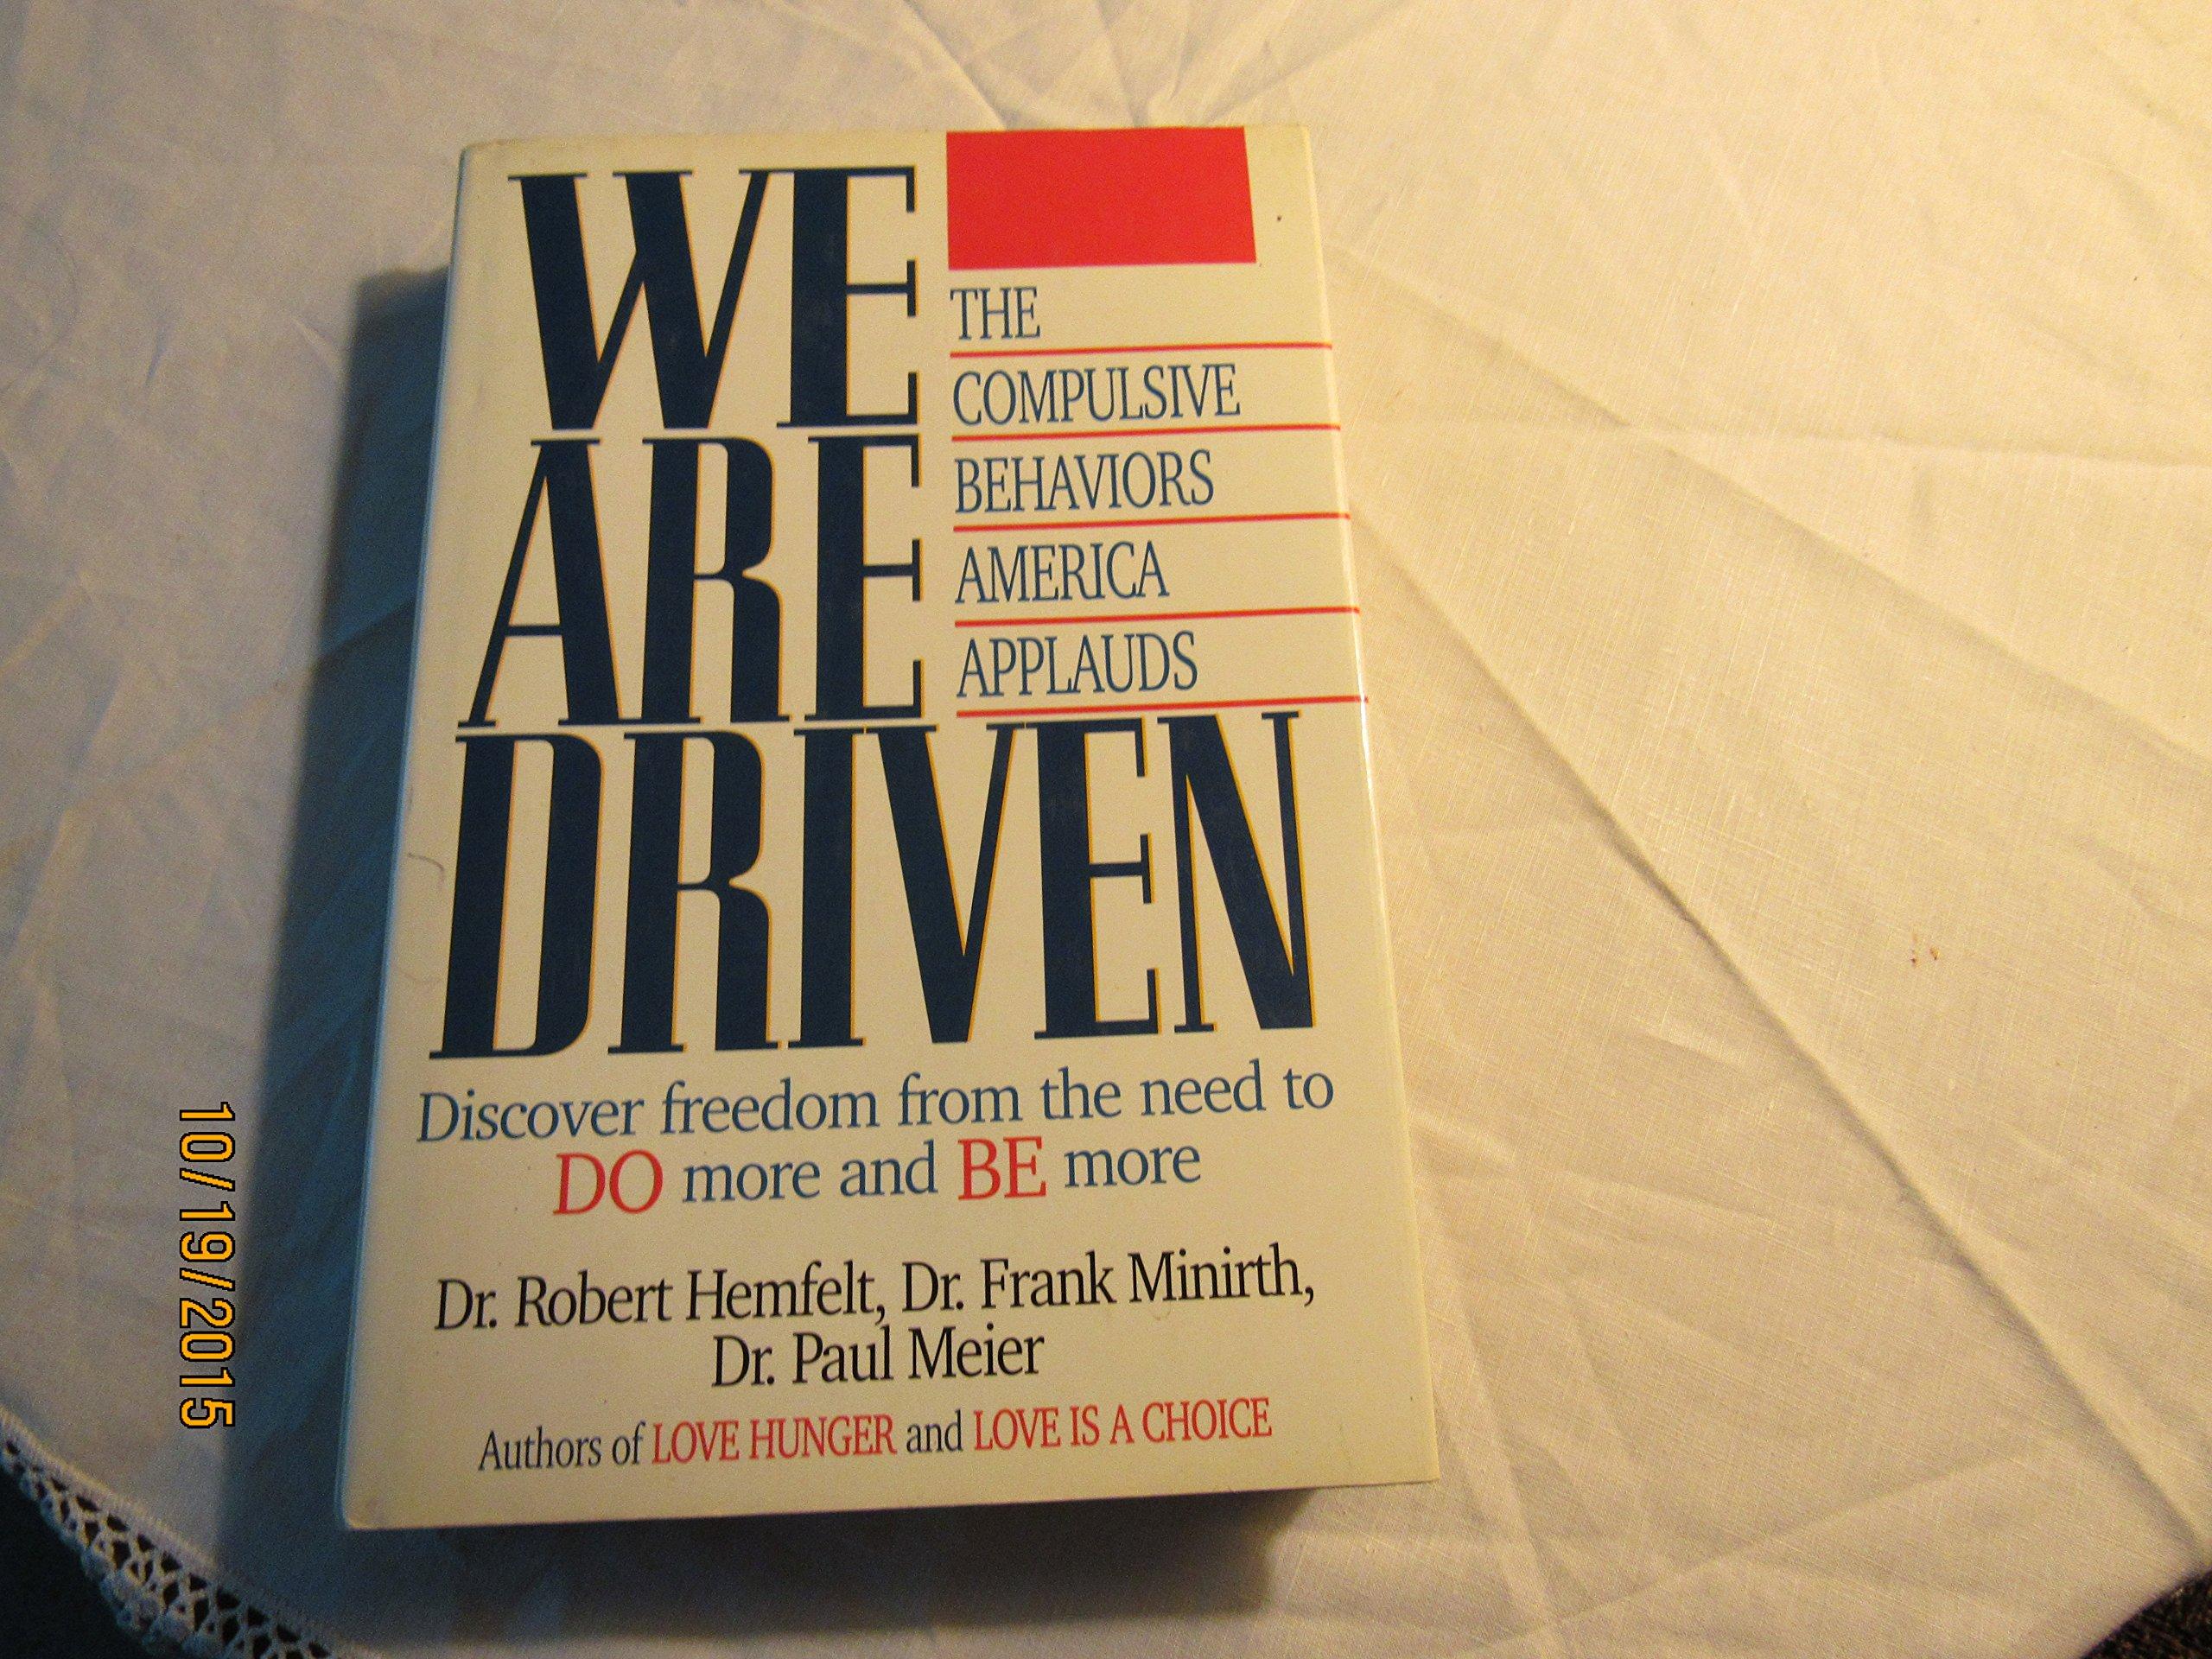 We Are Driven: The Compulsive Behaviors America Applauds: Robert Hemfelt,  Frank Minirth, Paul Meier: 9780840770714: Amazon.com: Books